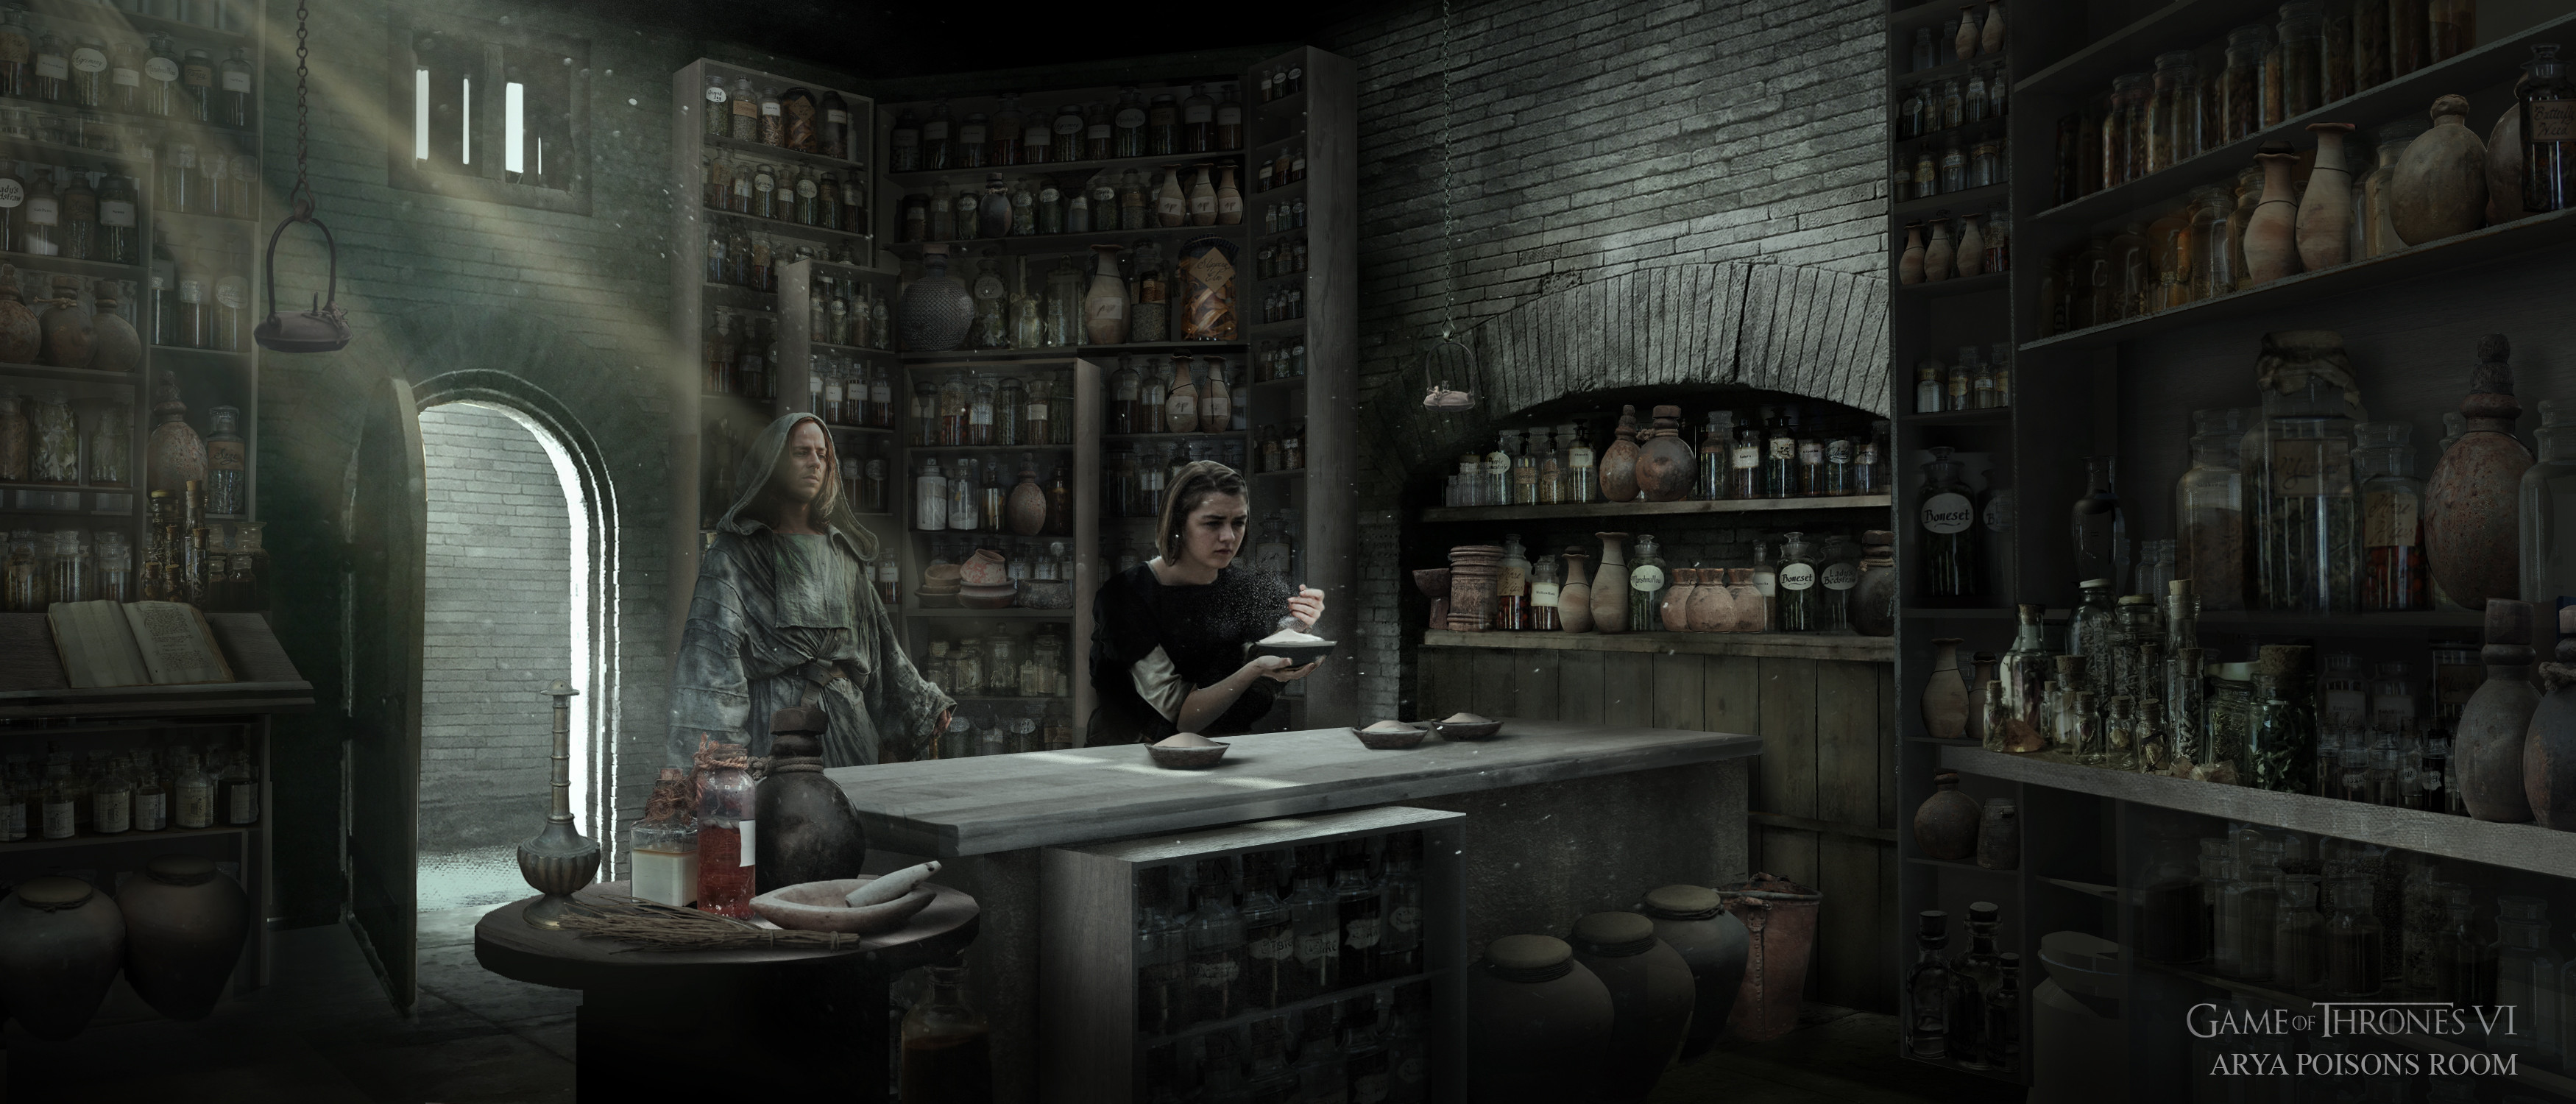 Arya, Poisons room